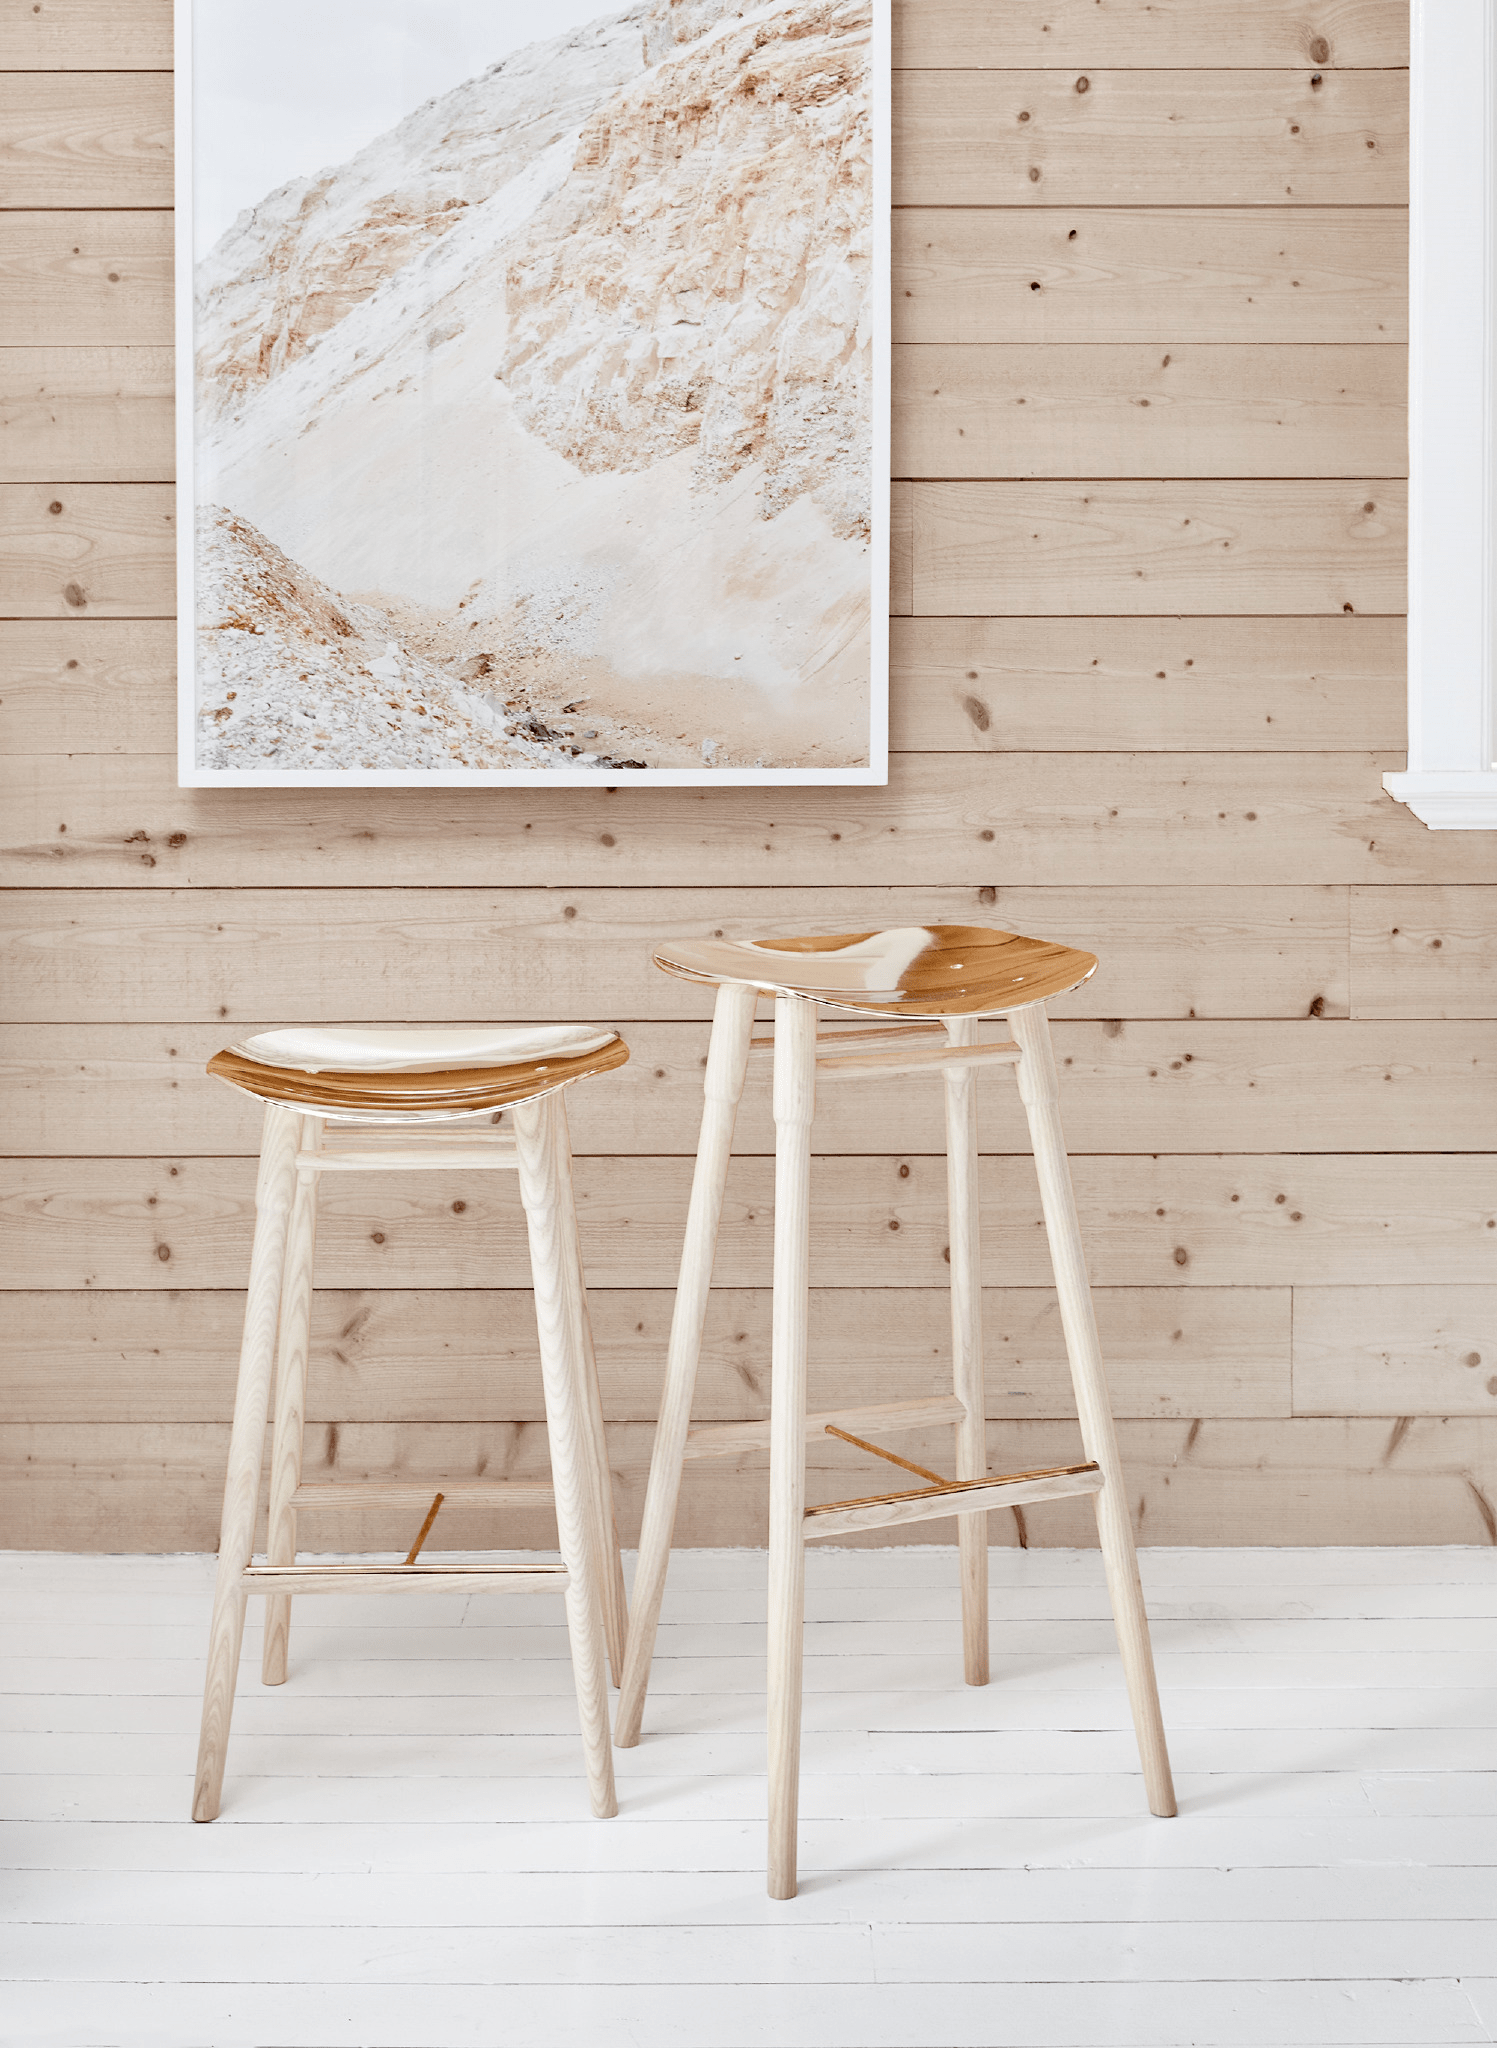 Gallery Of Dowel Stool By Mr.fräg Local Australian Furniture And Industrial Design Sydney, Nsw Image 1